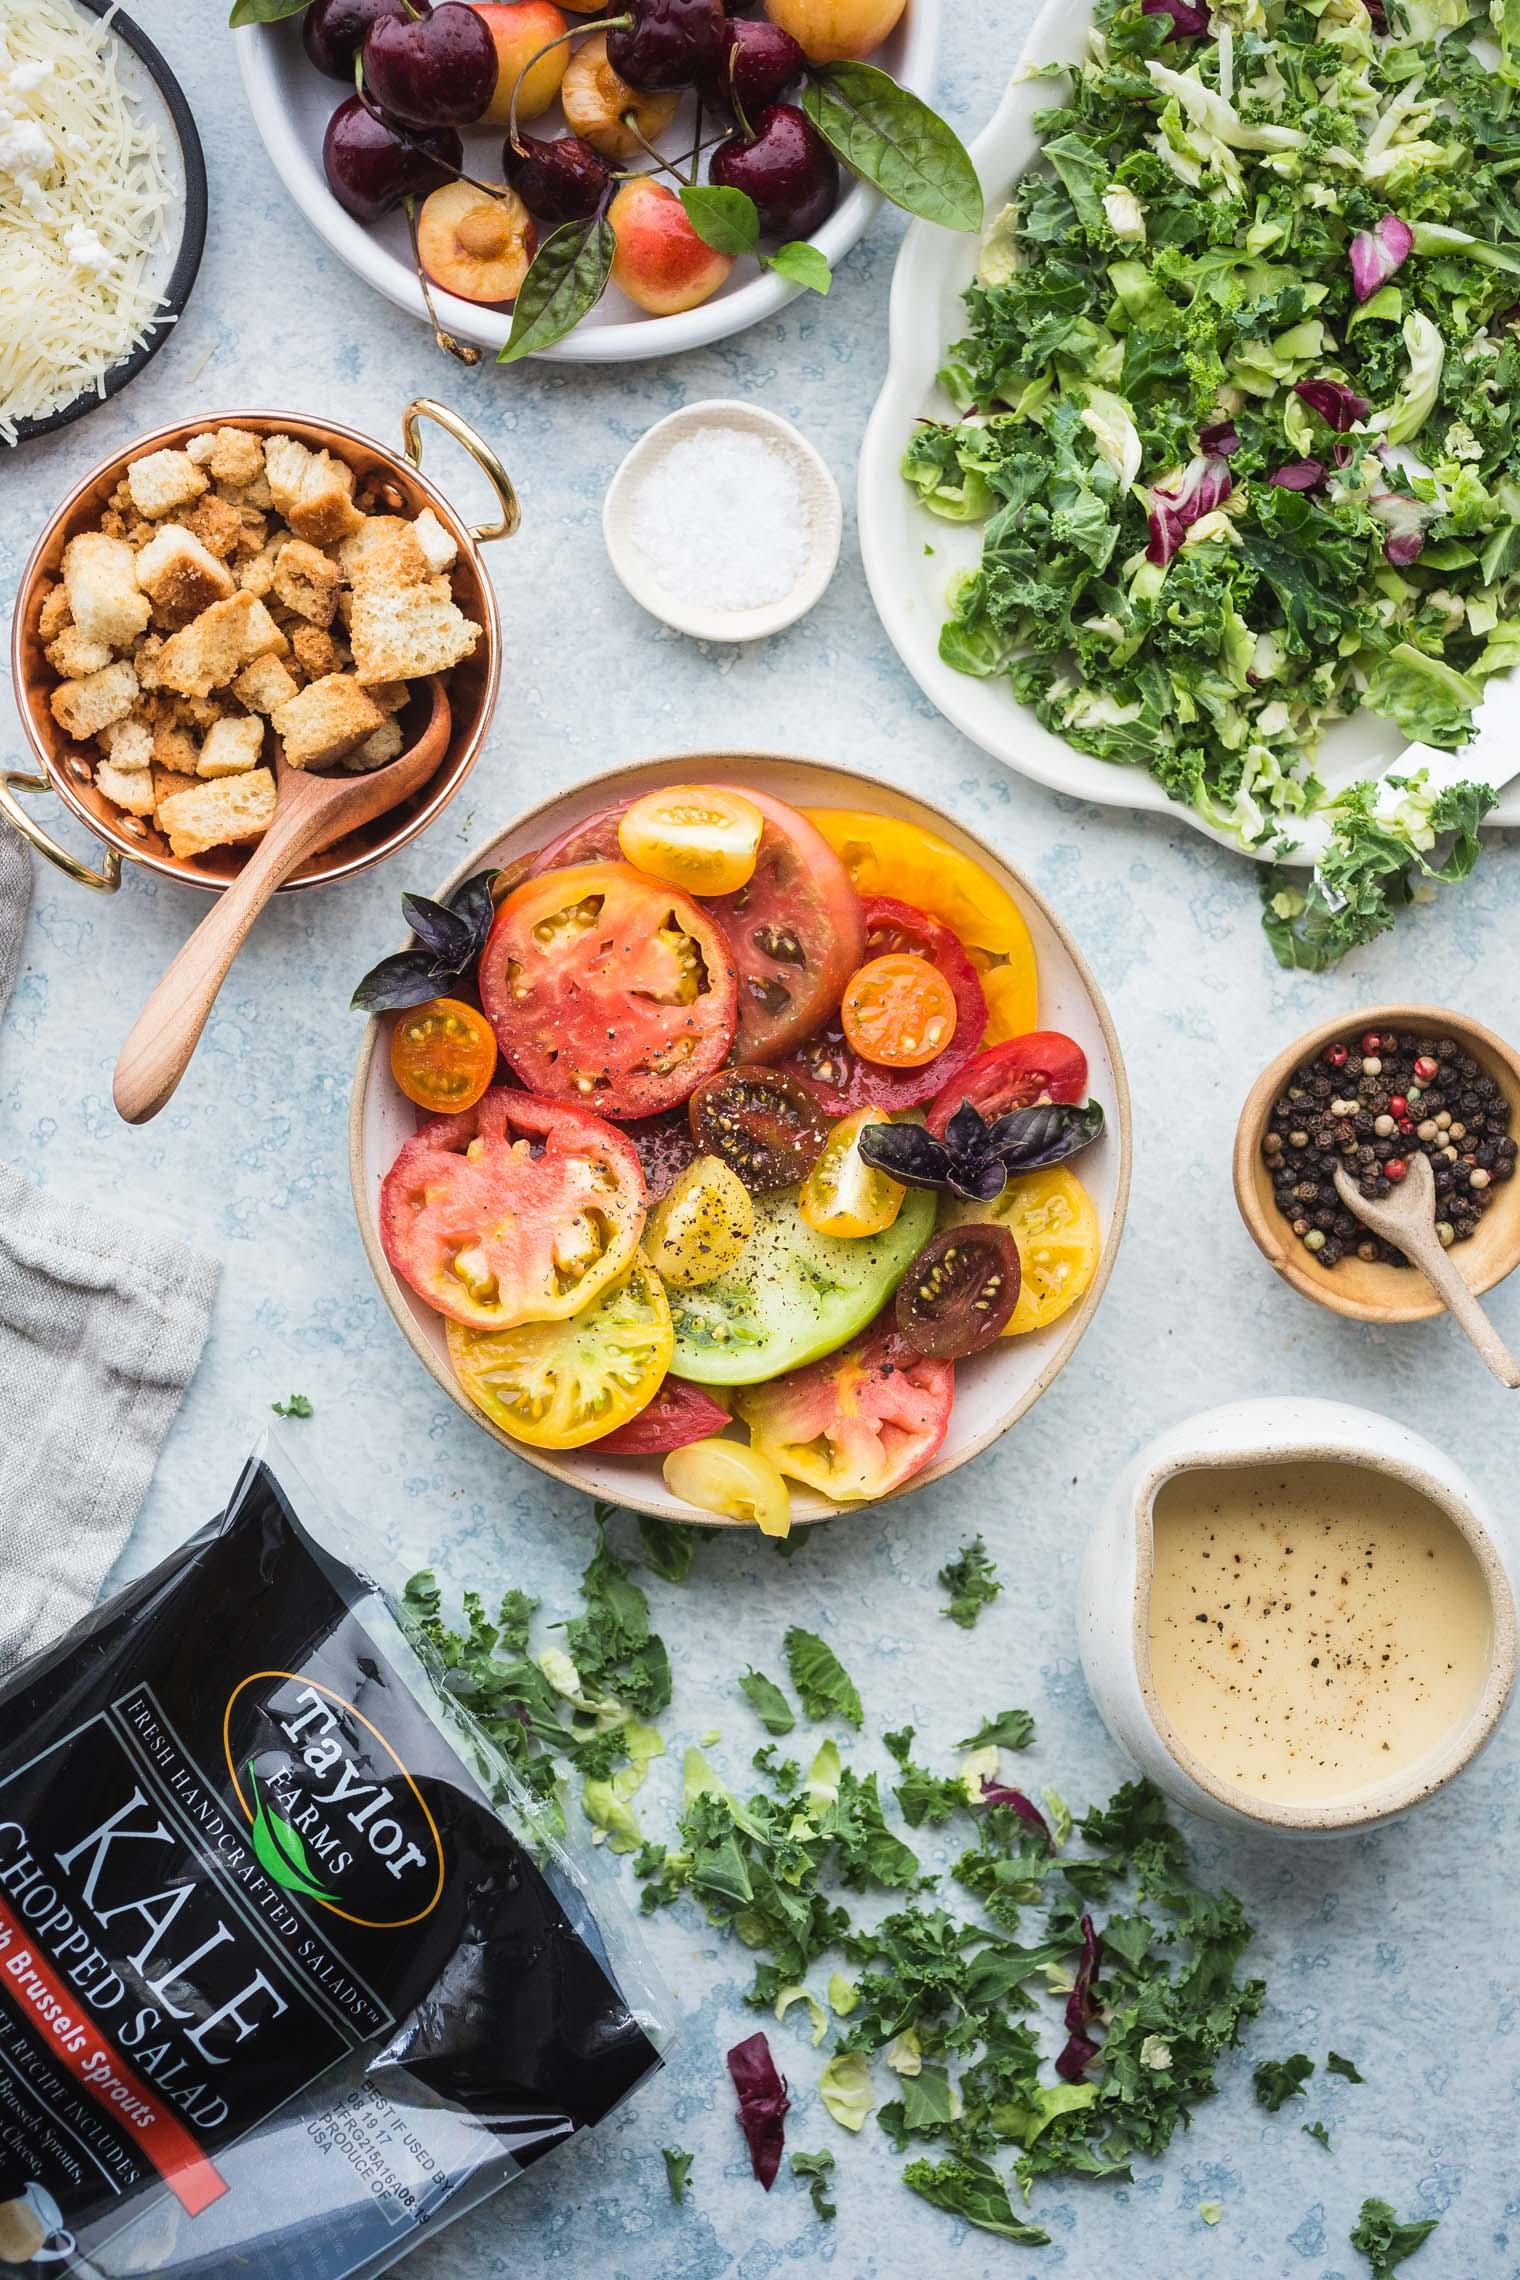 Tomato & Cherry Kale Salad with Lemon Vinaigrette